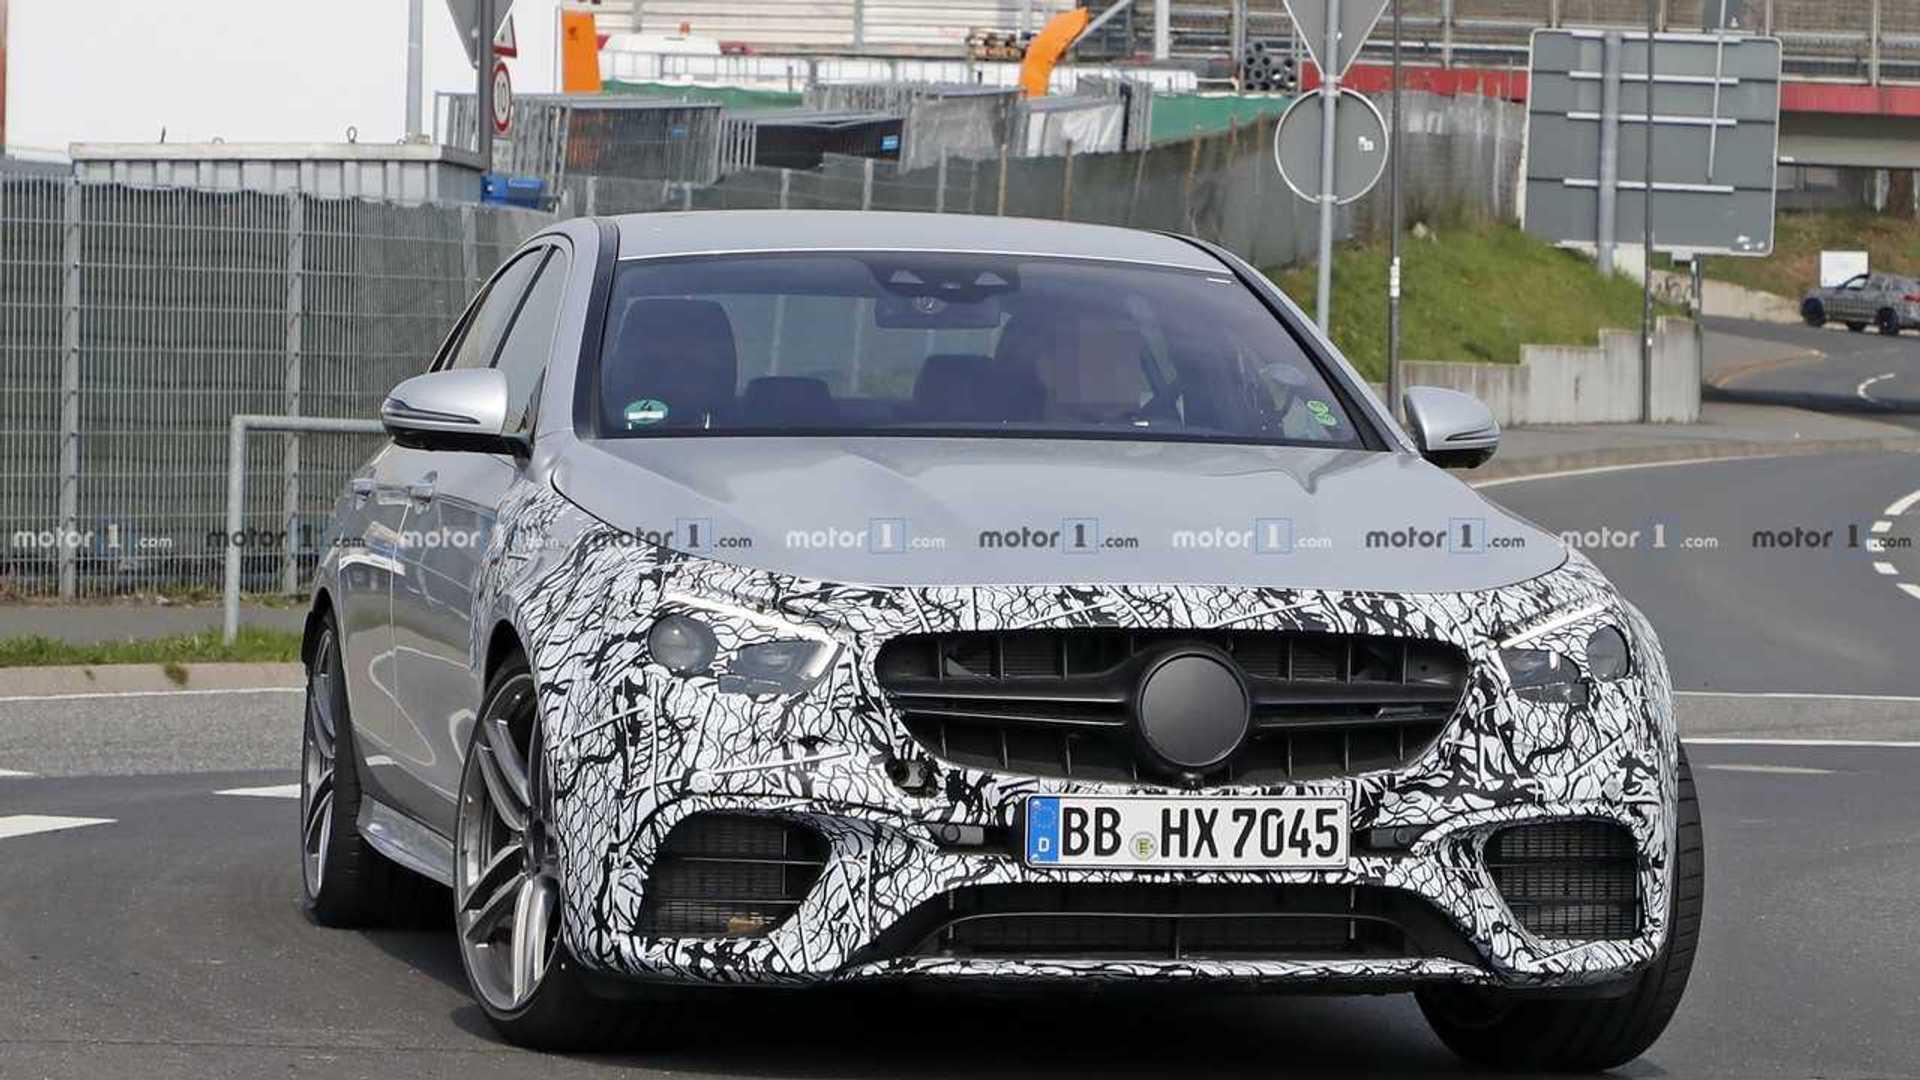 2020 - [Mercedes-Benz] Classe E restylée  - Page 2 2021-mercedes-amg-e63-sedan-spy-photo